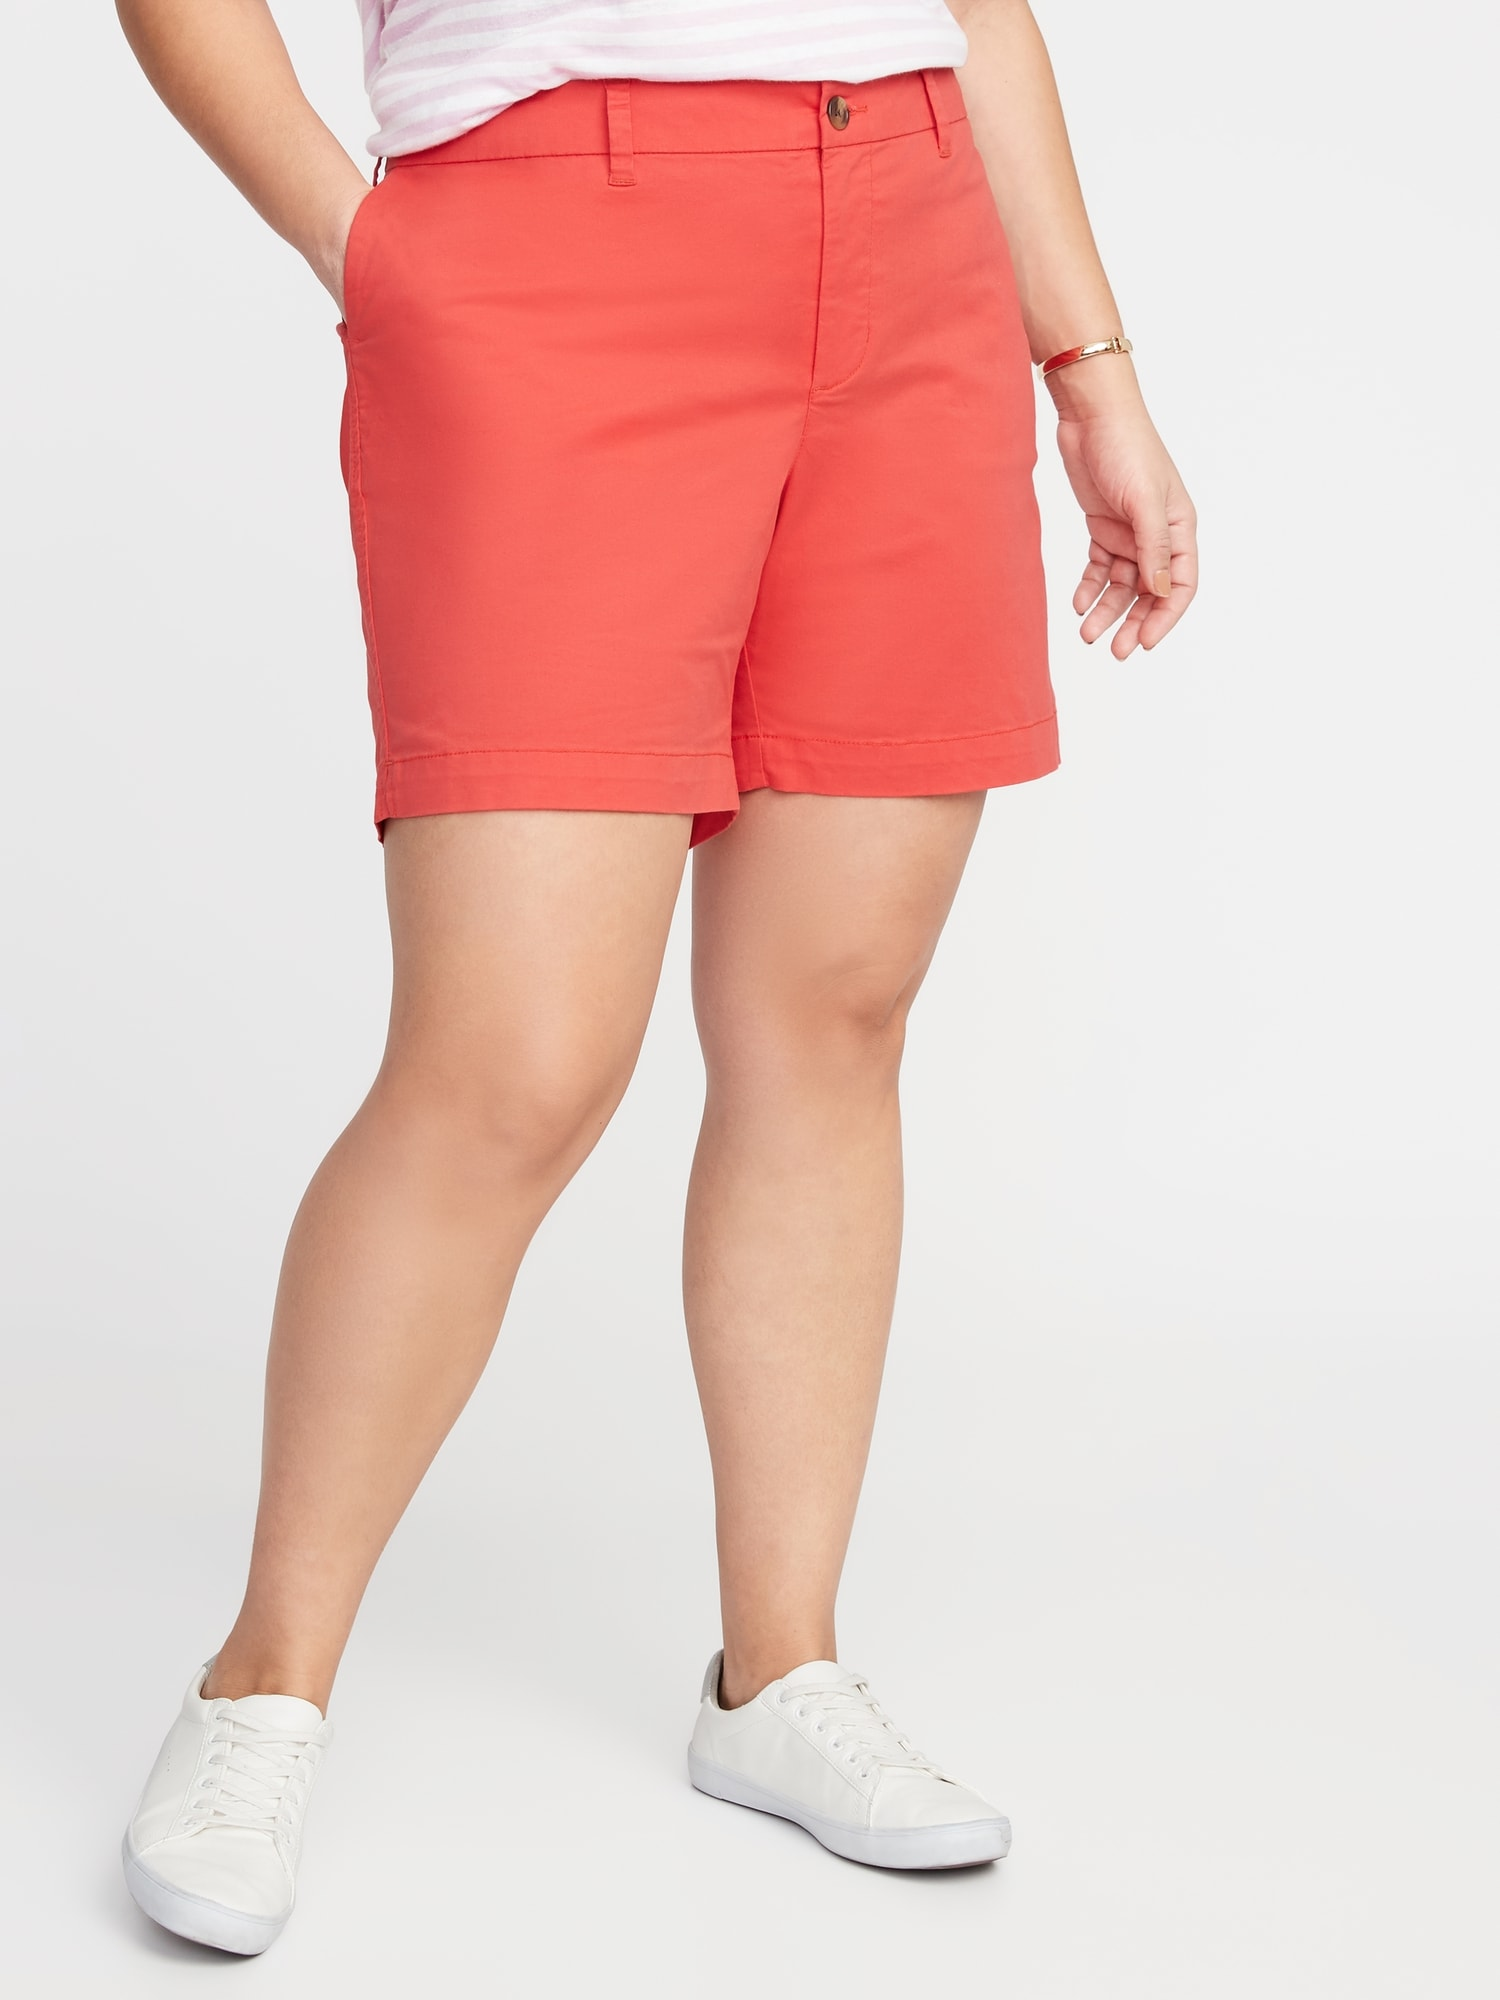 a5db0b3562c Mid-Rise Plus-Size Twill Everyday Shorts - 7-Inch Inseam